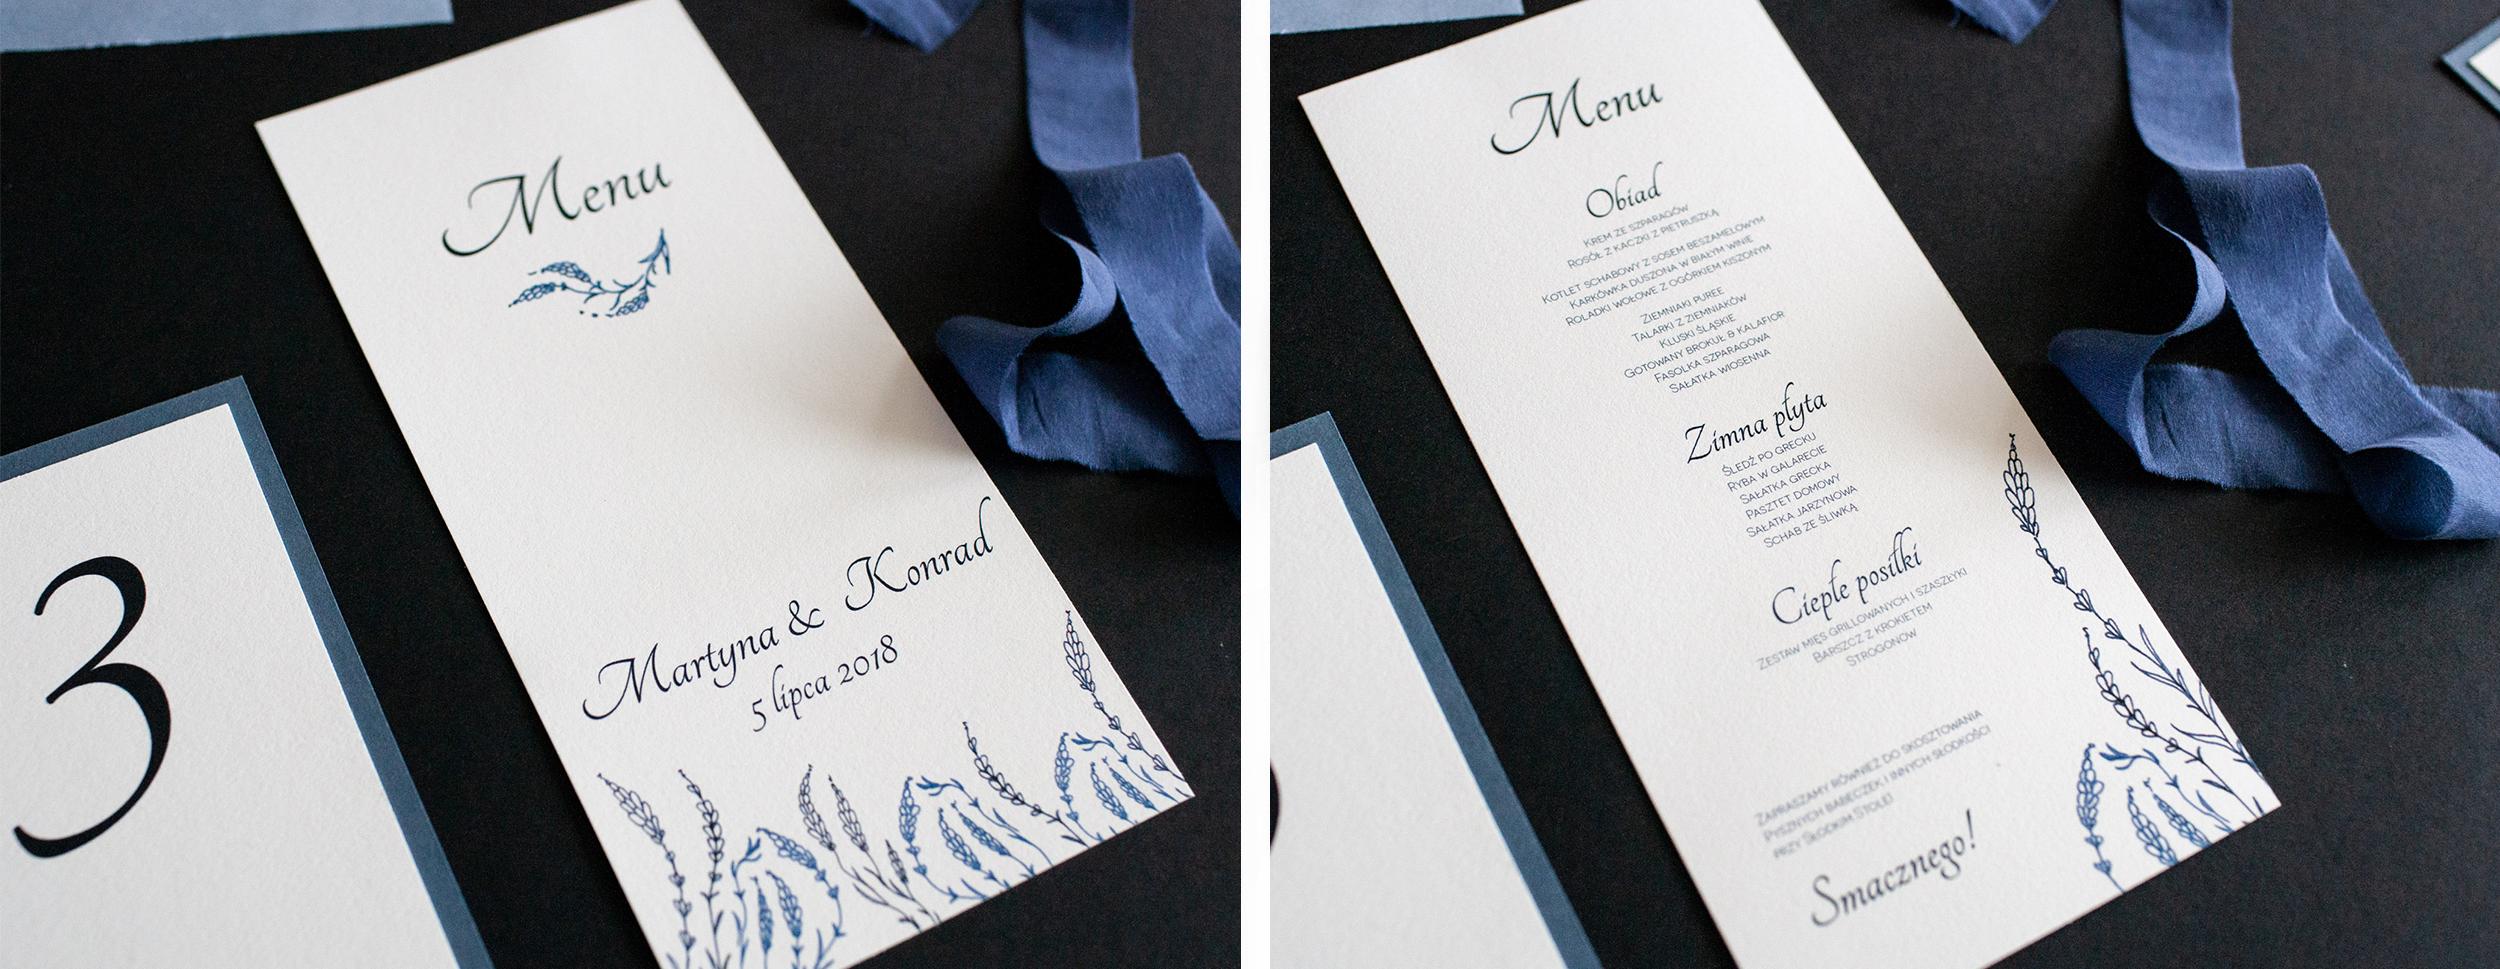 menu, menu dusty blue